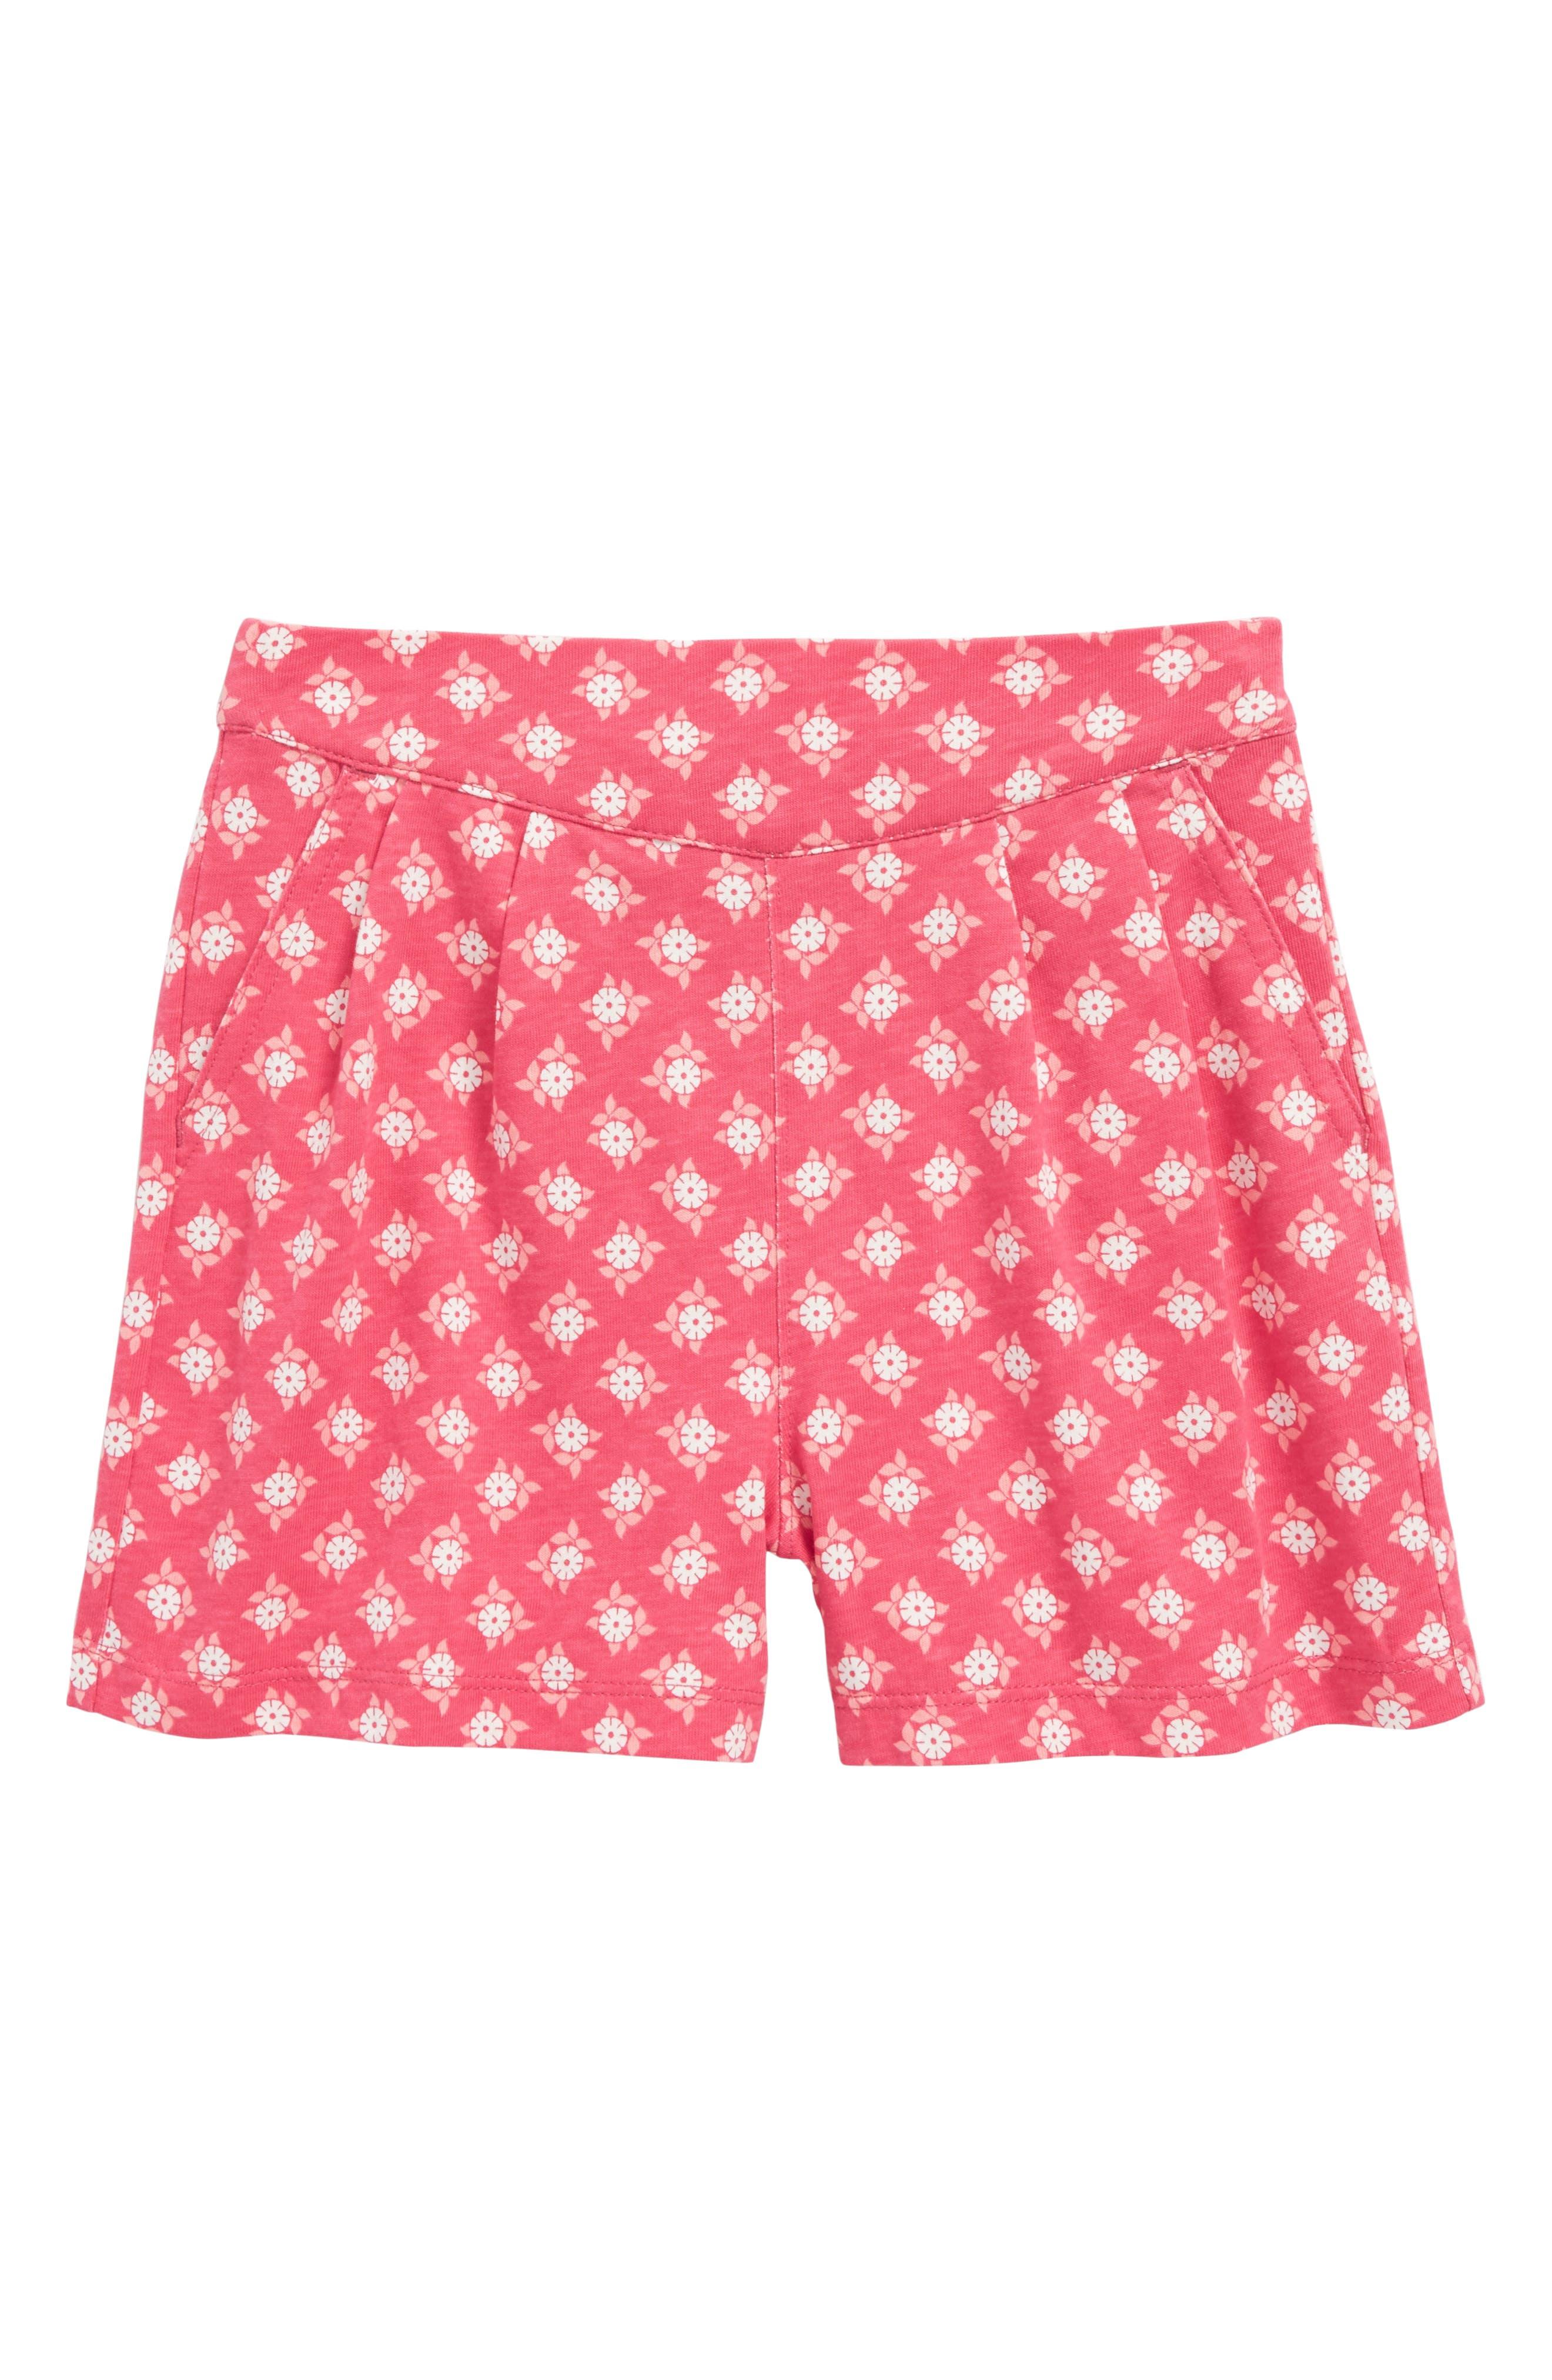 Sunburst Deck Shorts,                         Main,                         color, Azalea